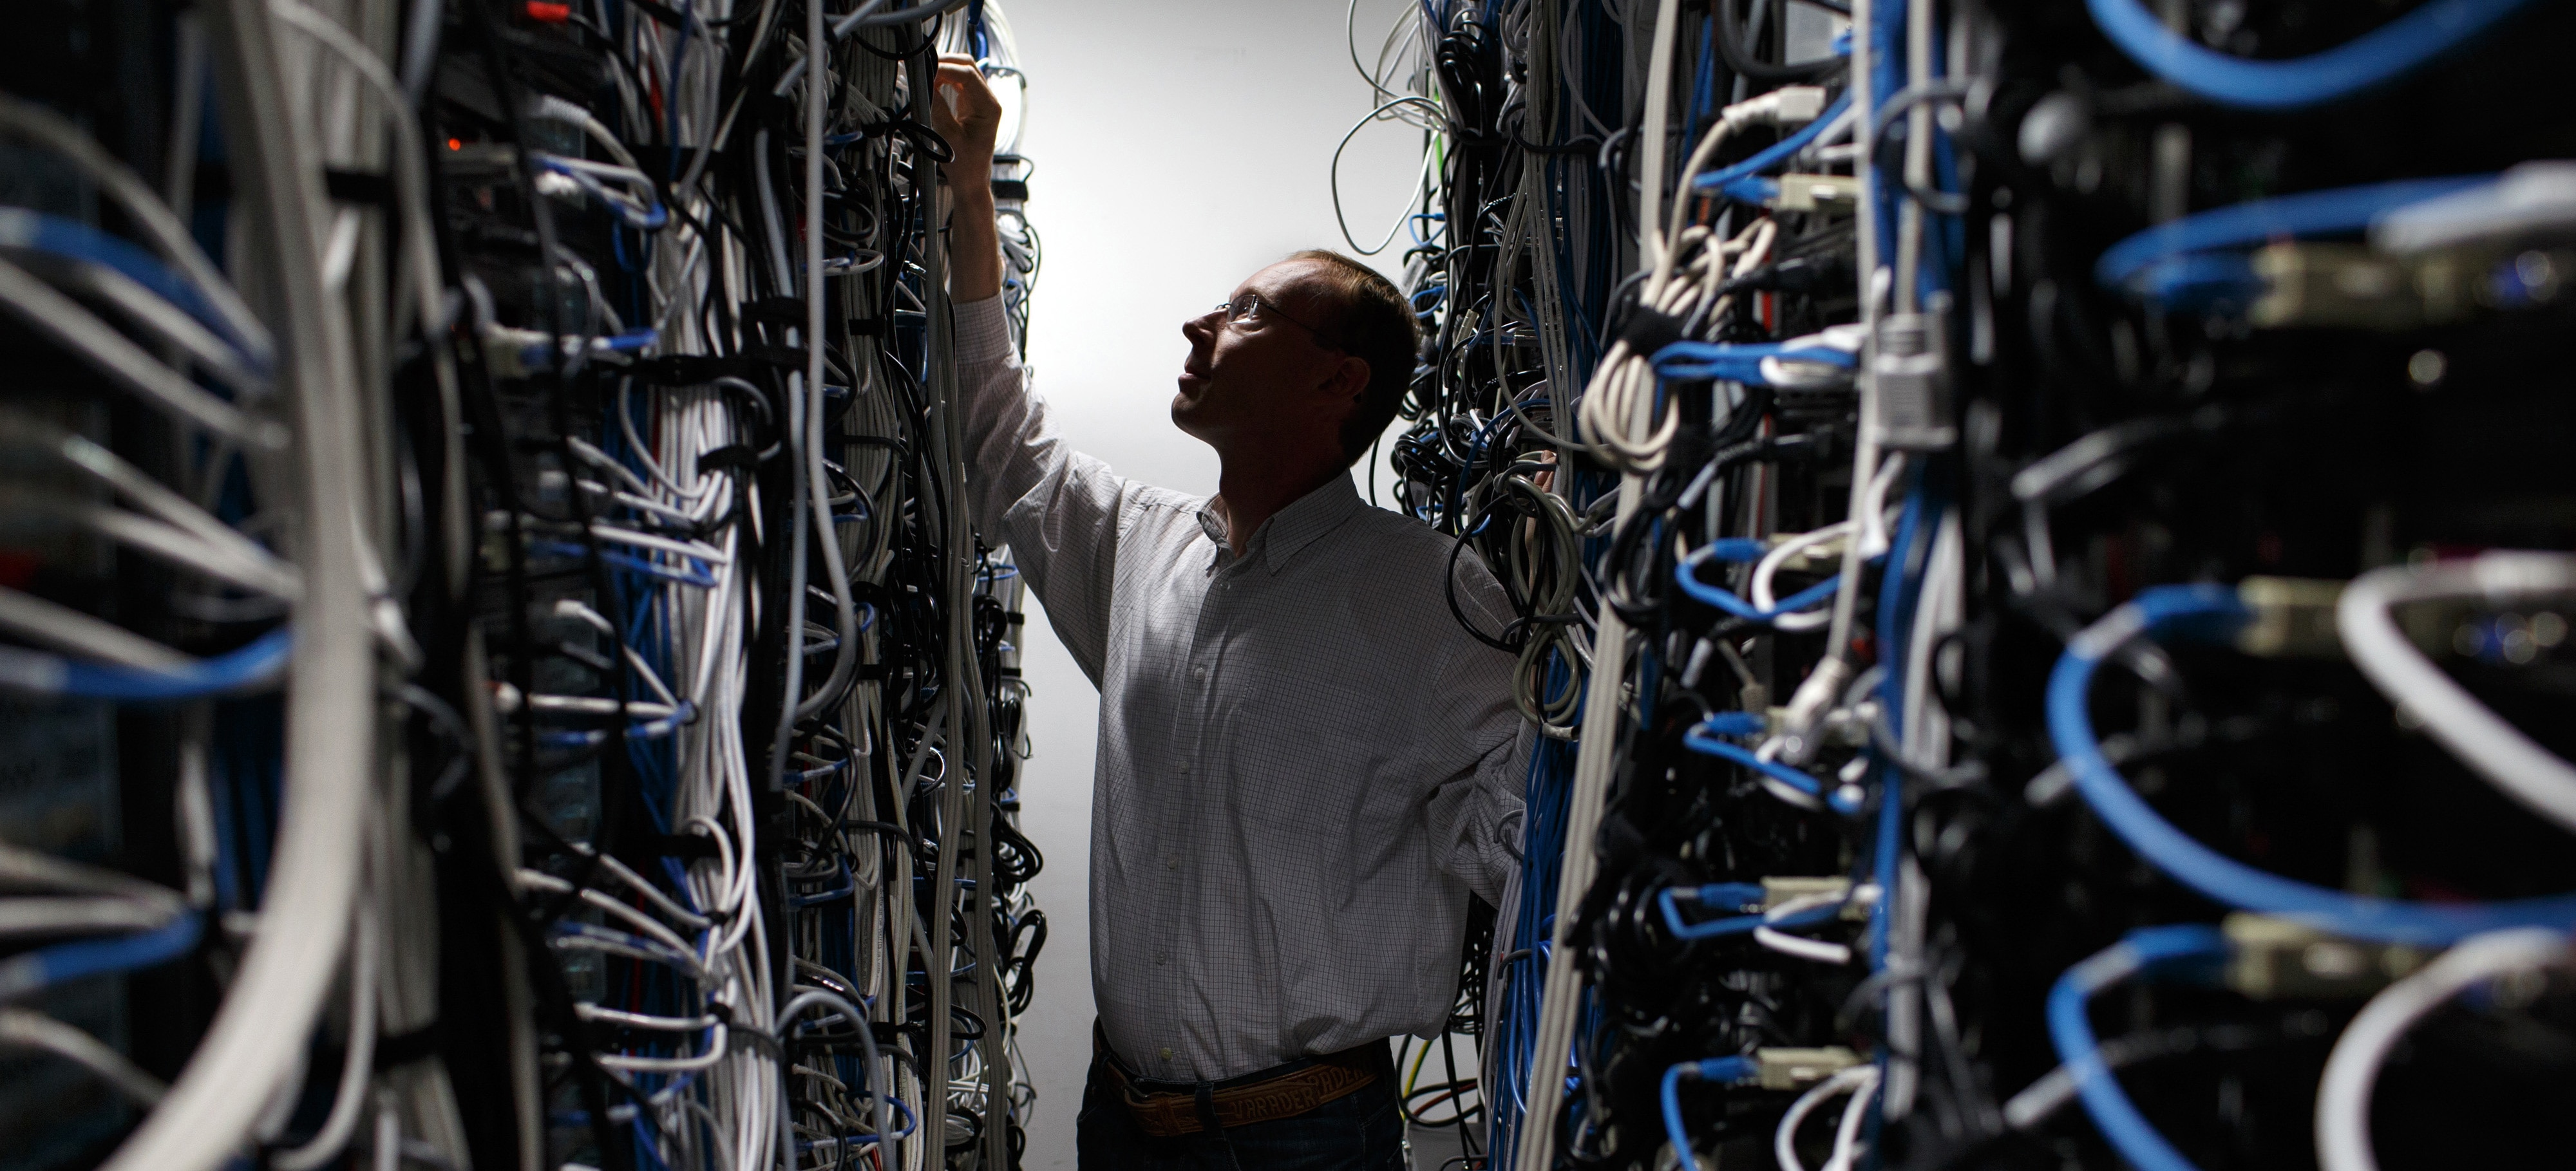 Data Center, Data Centre, Servers, Data, Cables